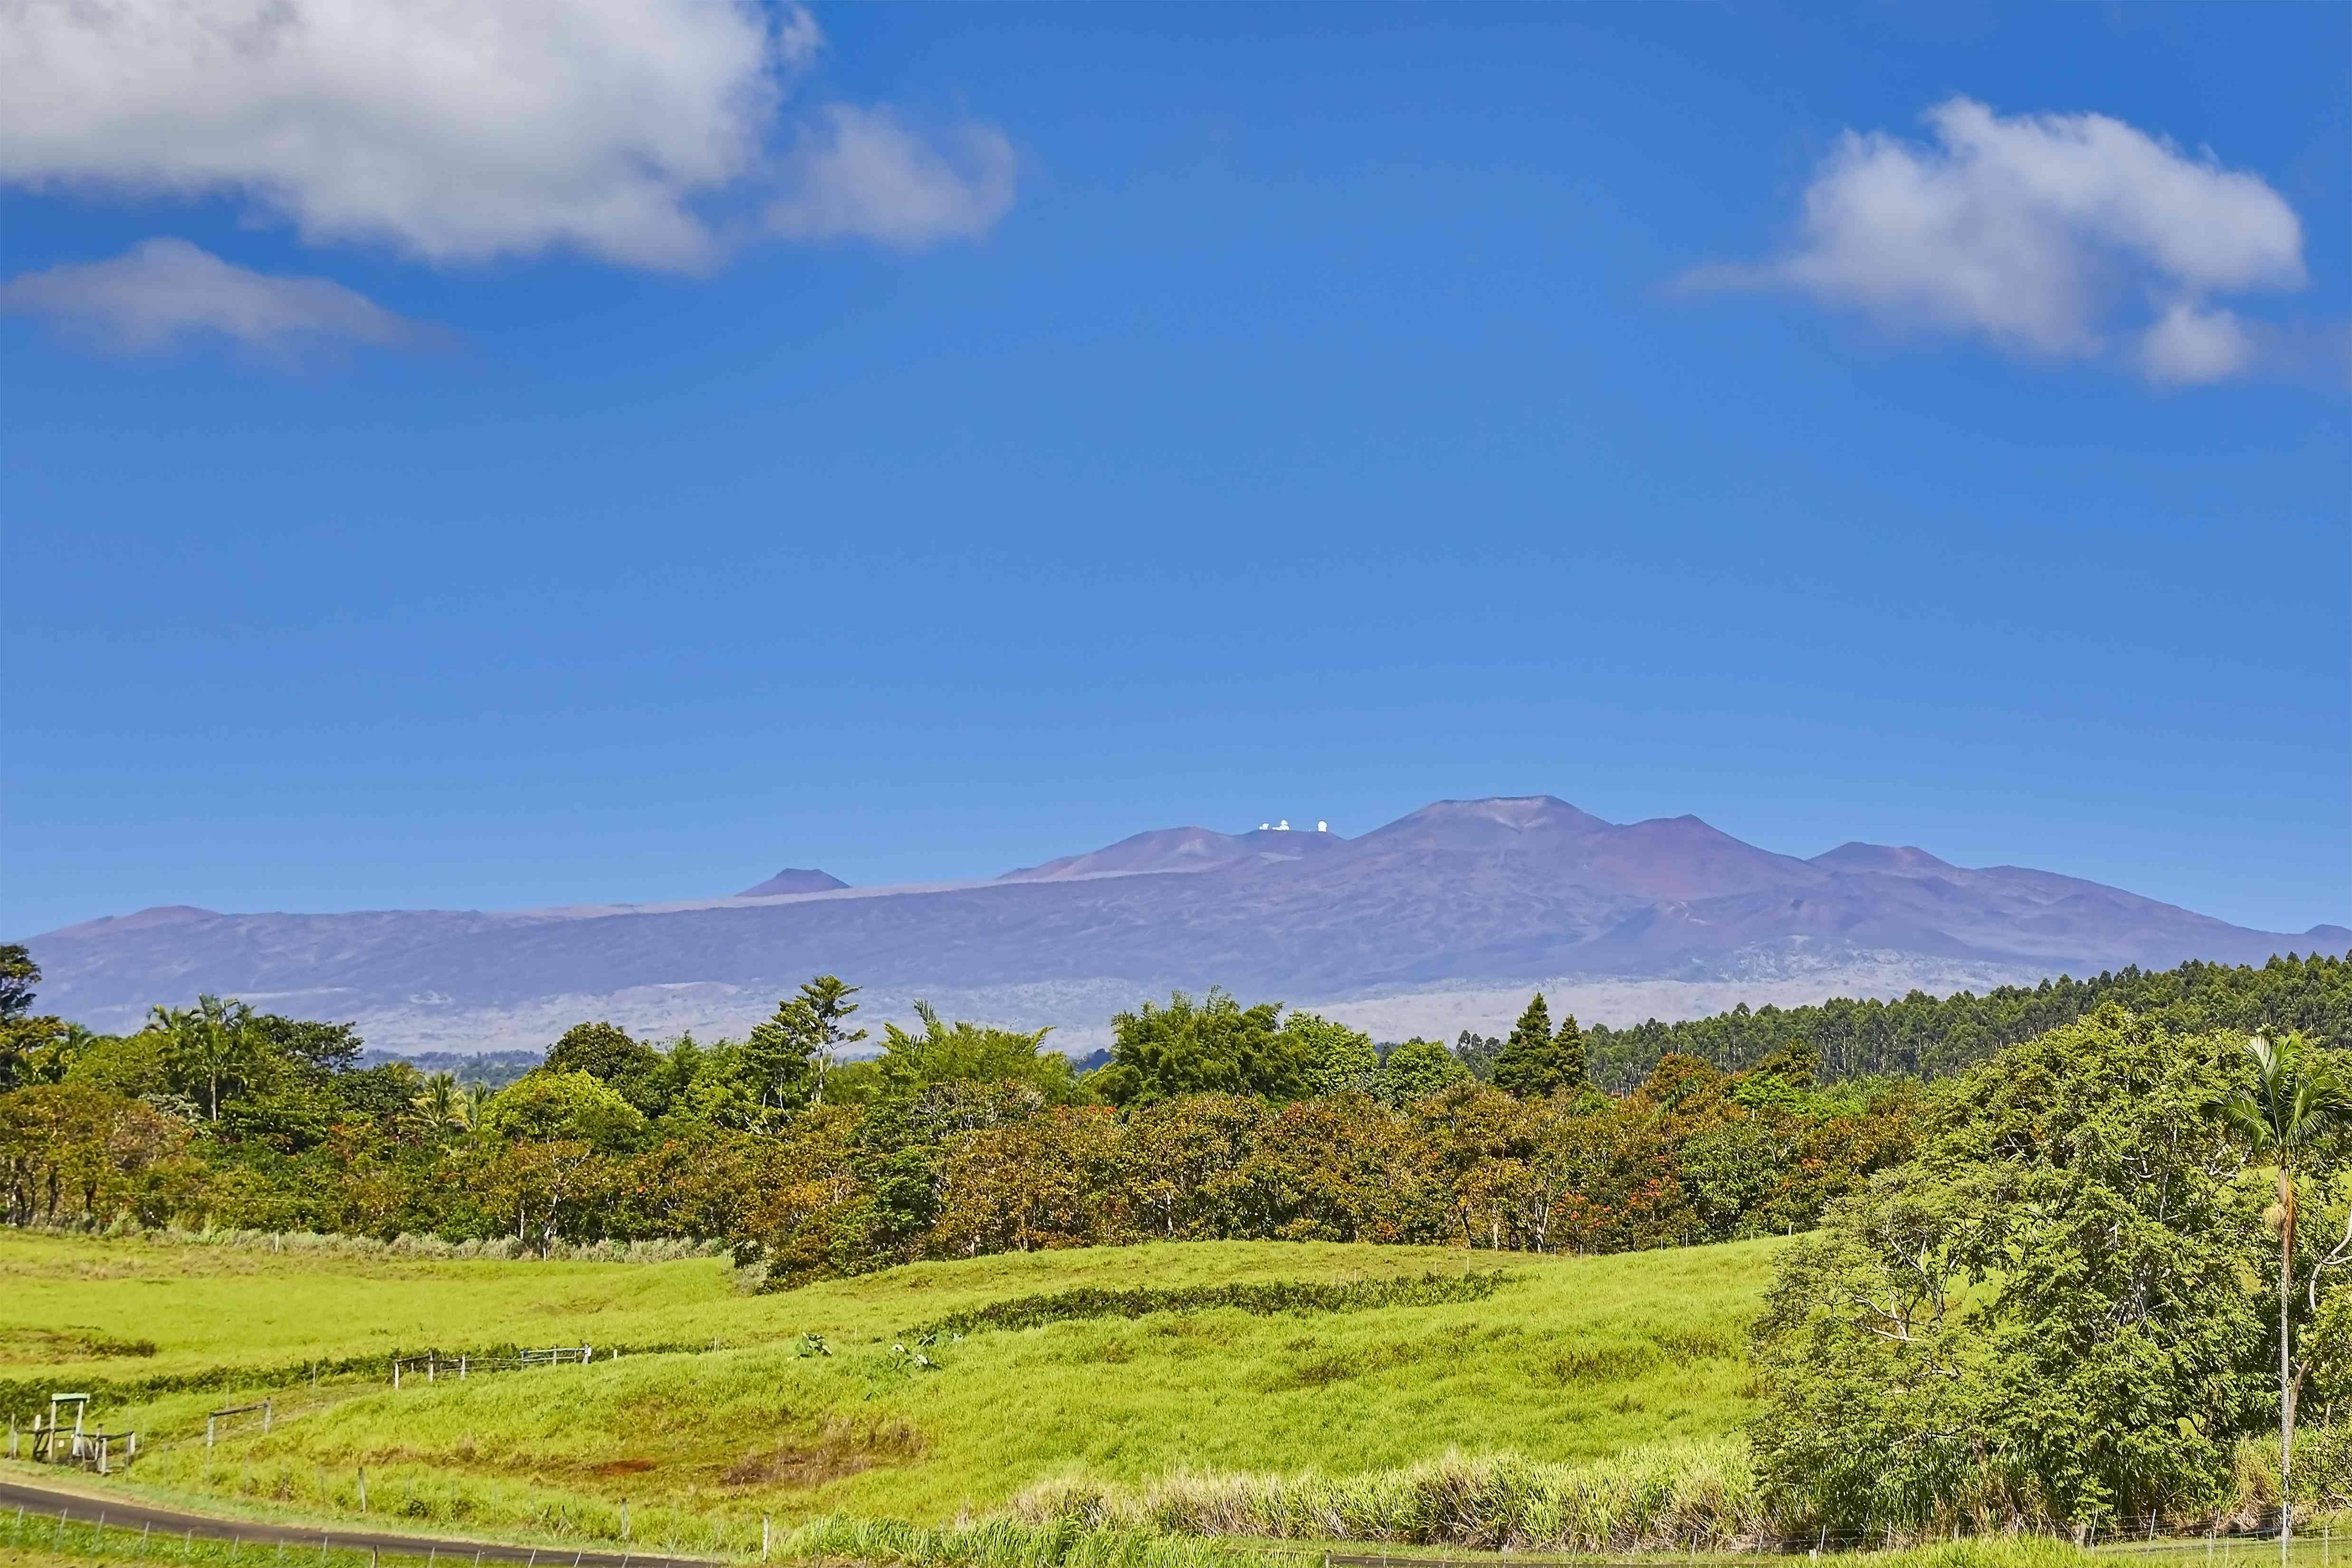 Mauna Kea summit with Astronomical Observatories,Waimea,Big Island,Hawaii,USA